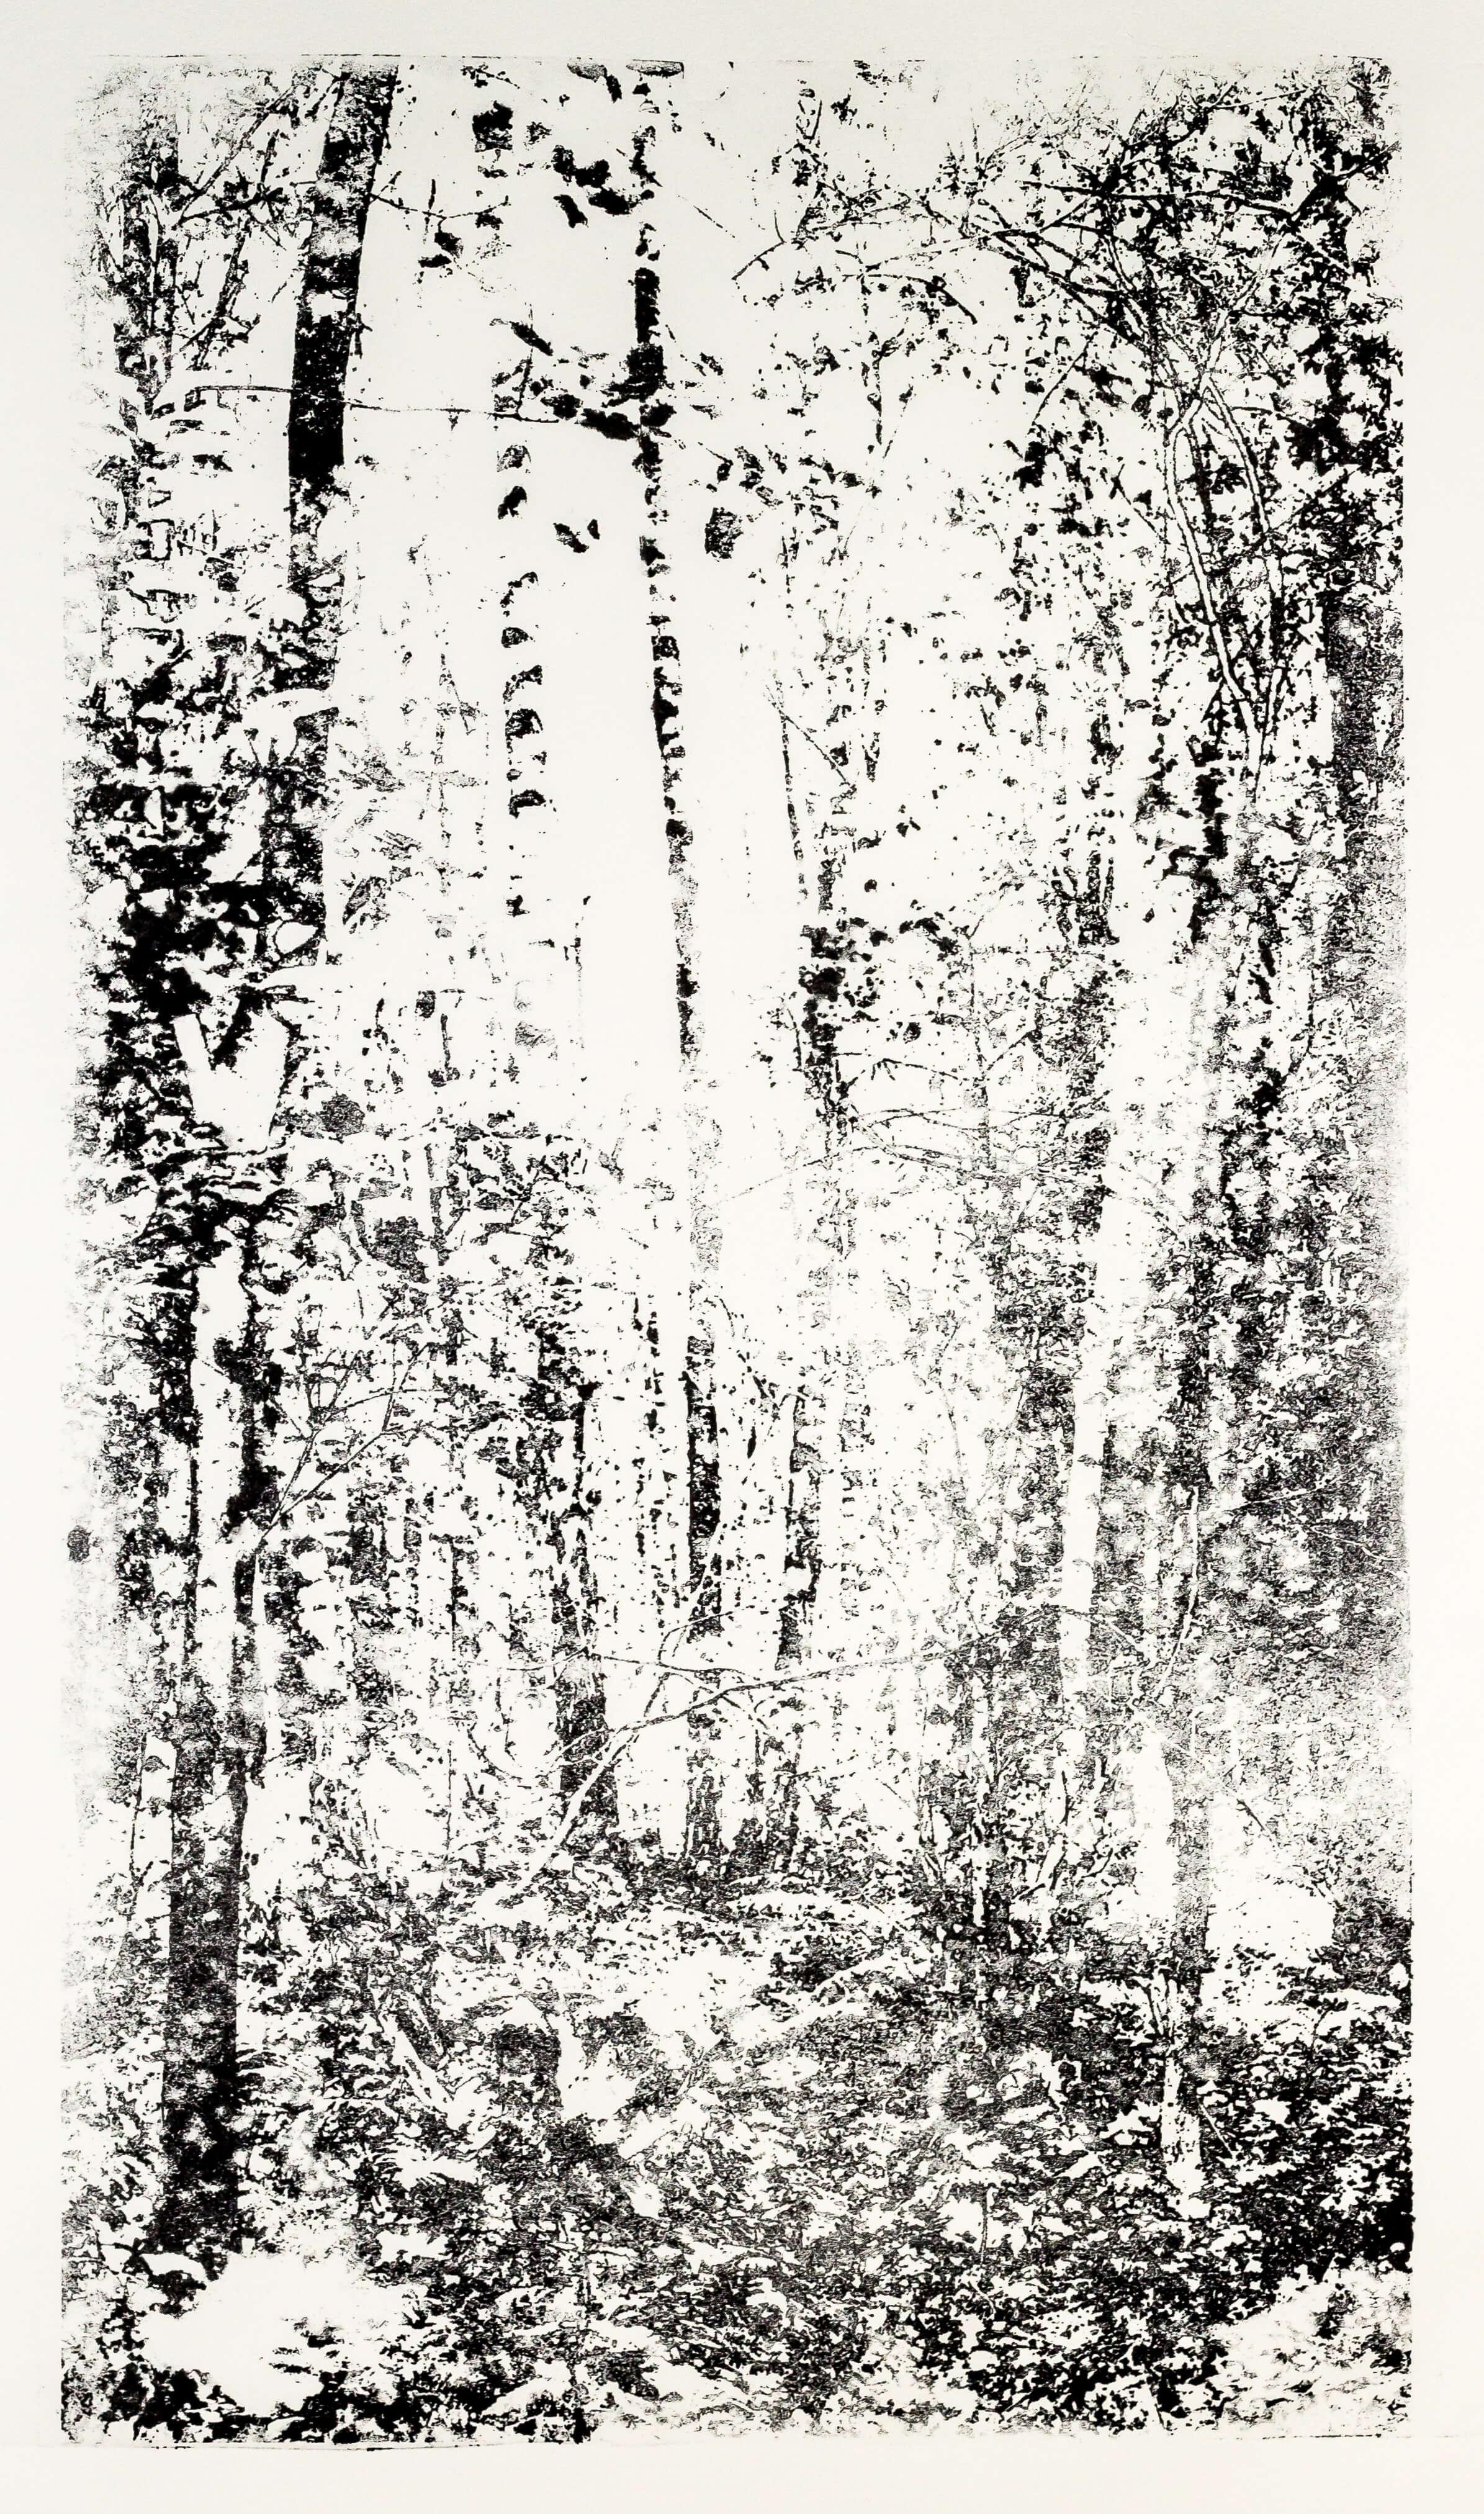 Katharina Albers, Wald XX-IV, 2015, Lithographie, Unikat, 60×33 cm